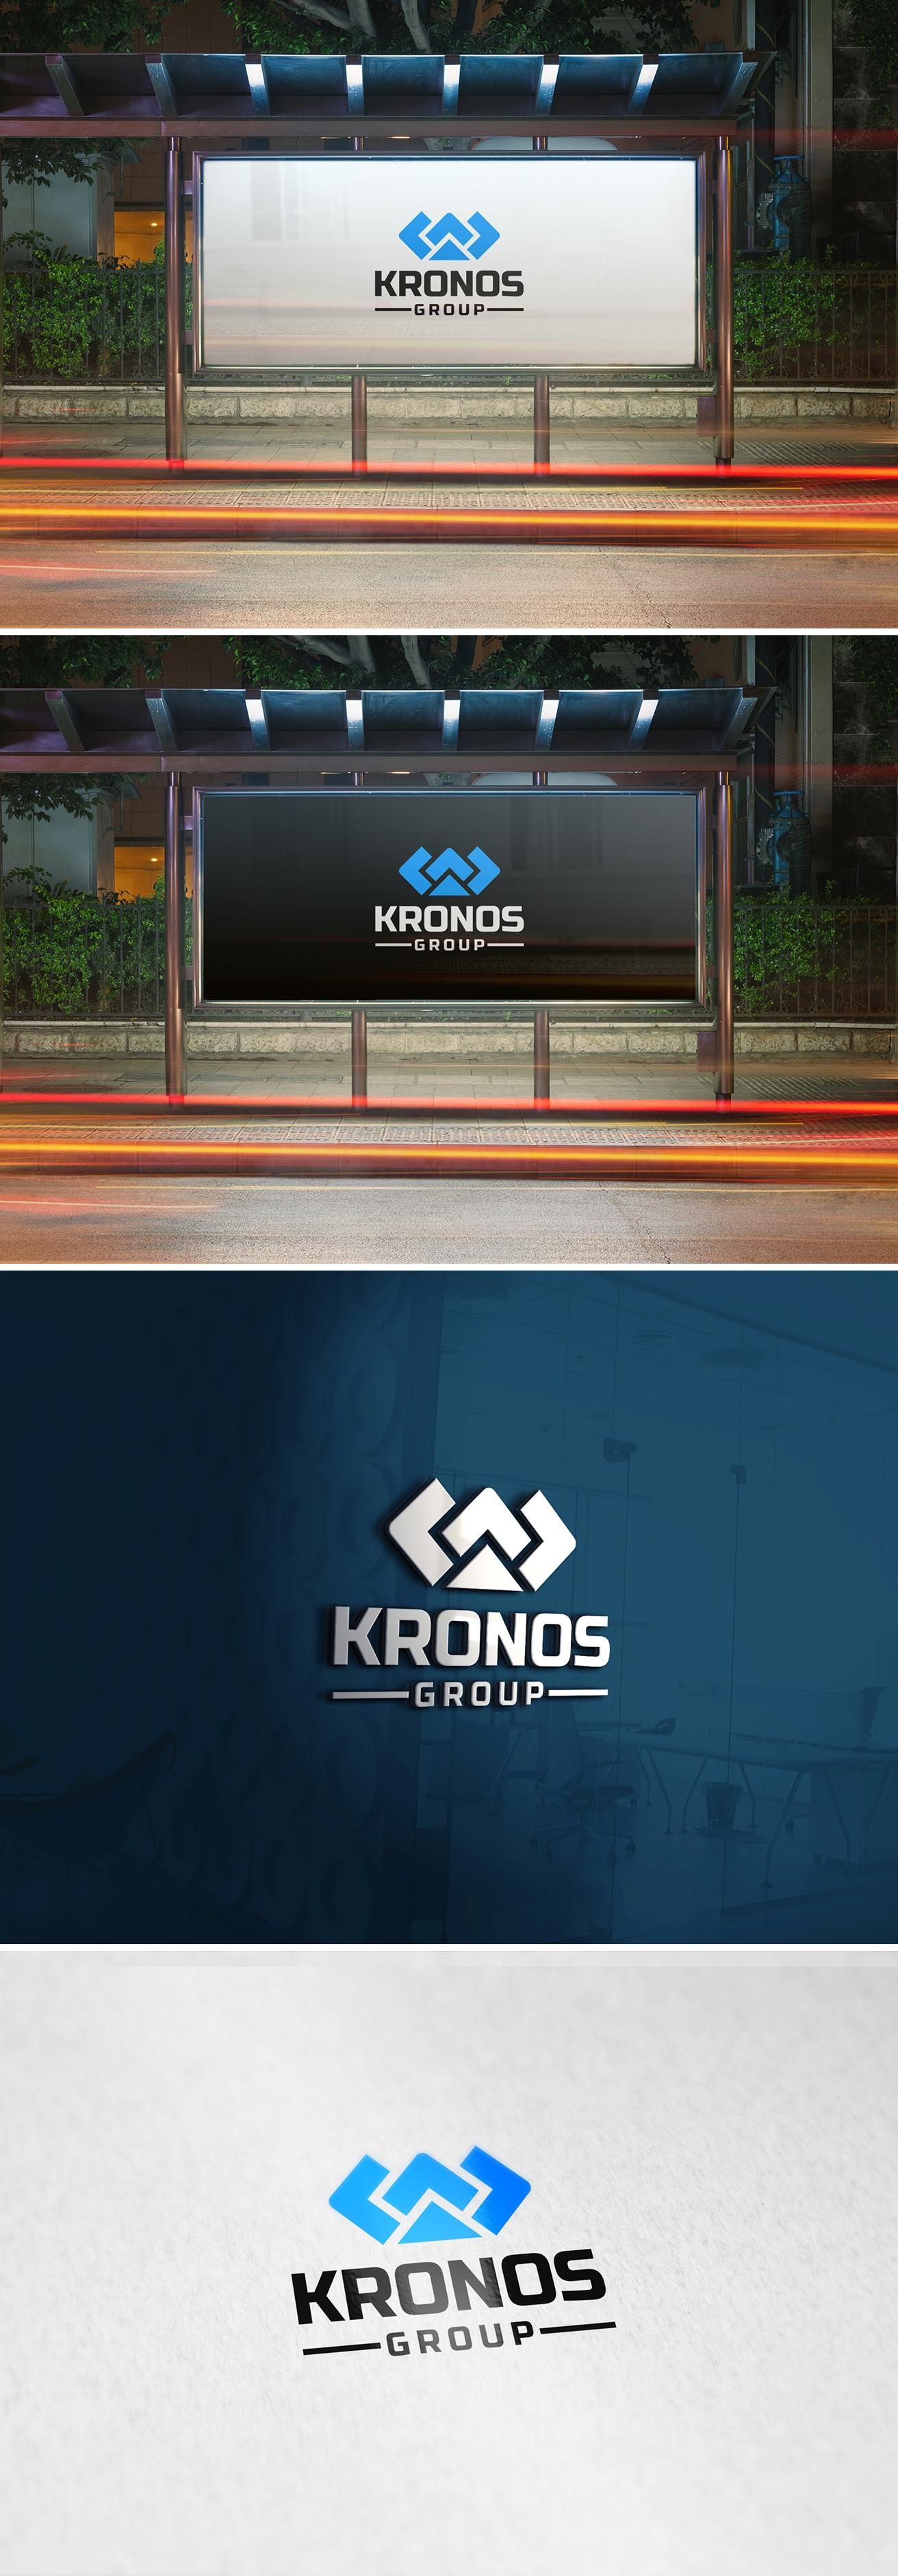 Разработать логотип KRONOS фото f_6045fafa8c5e1712.jpg